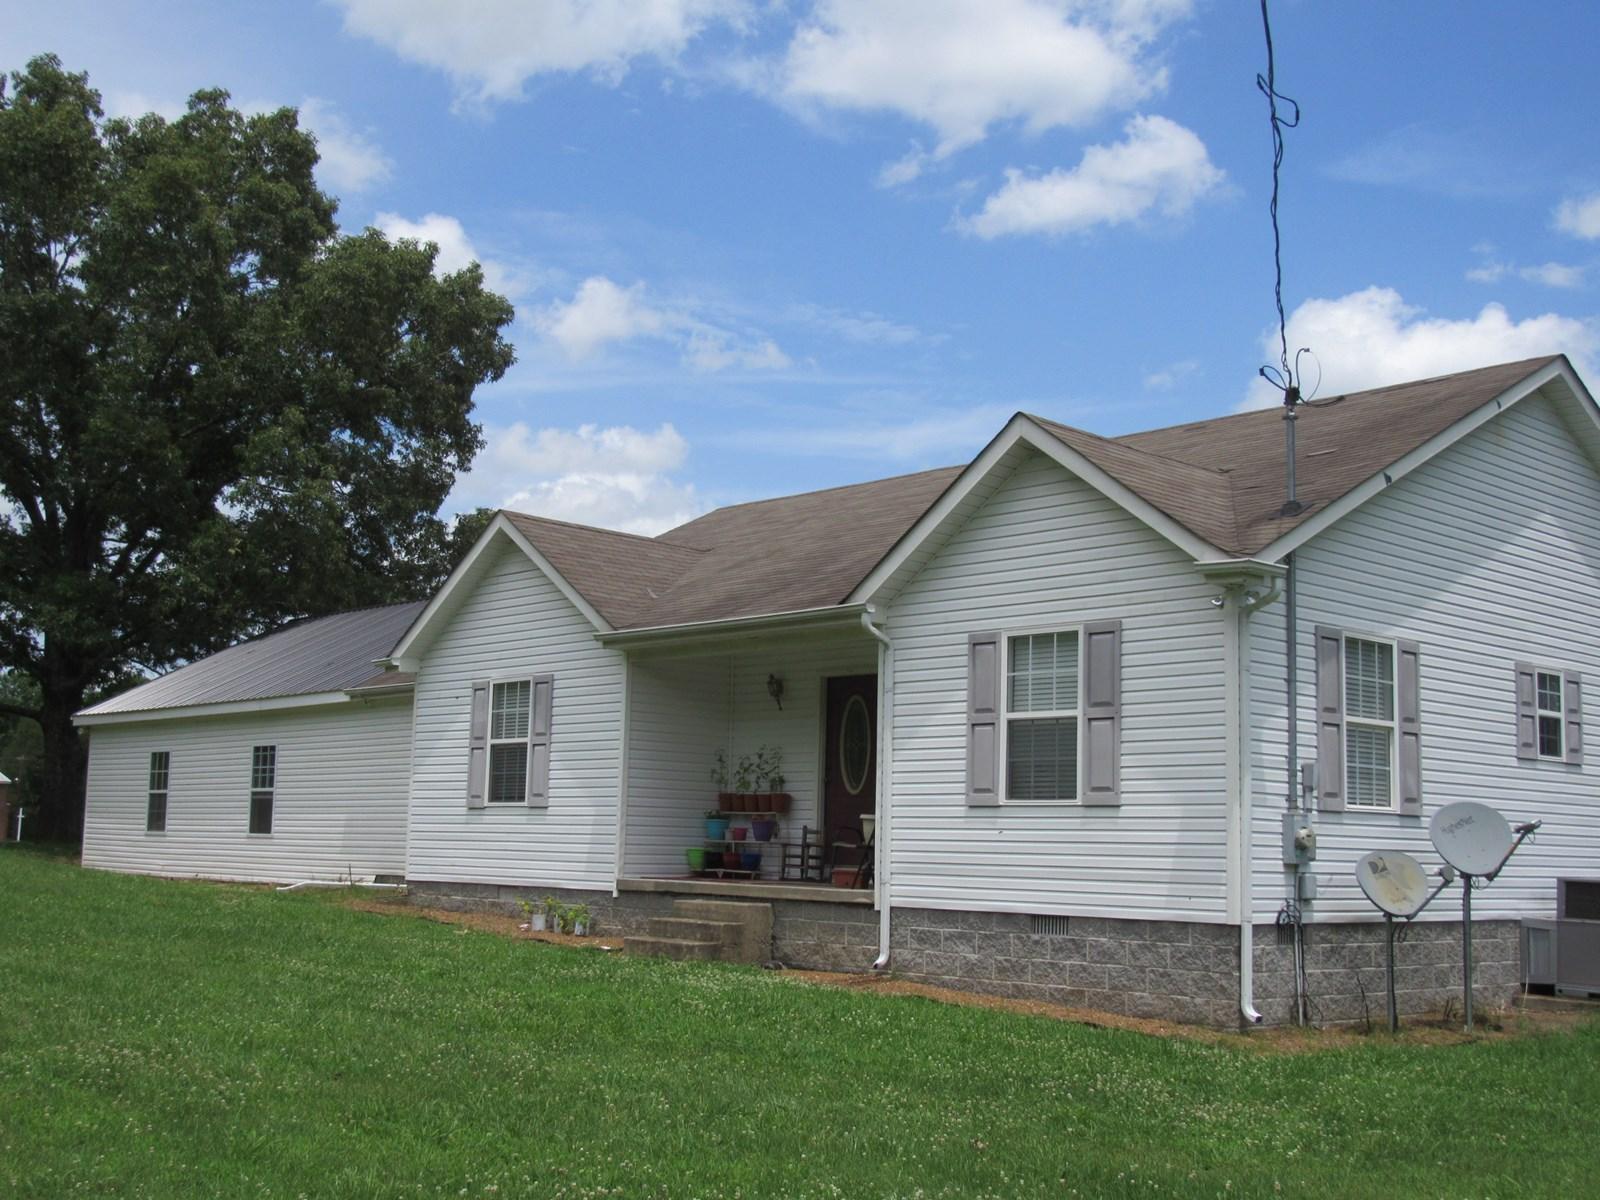 County Home & Acreage for Sale Lobelville TN